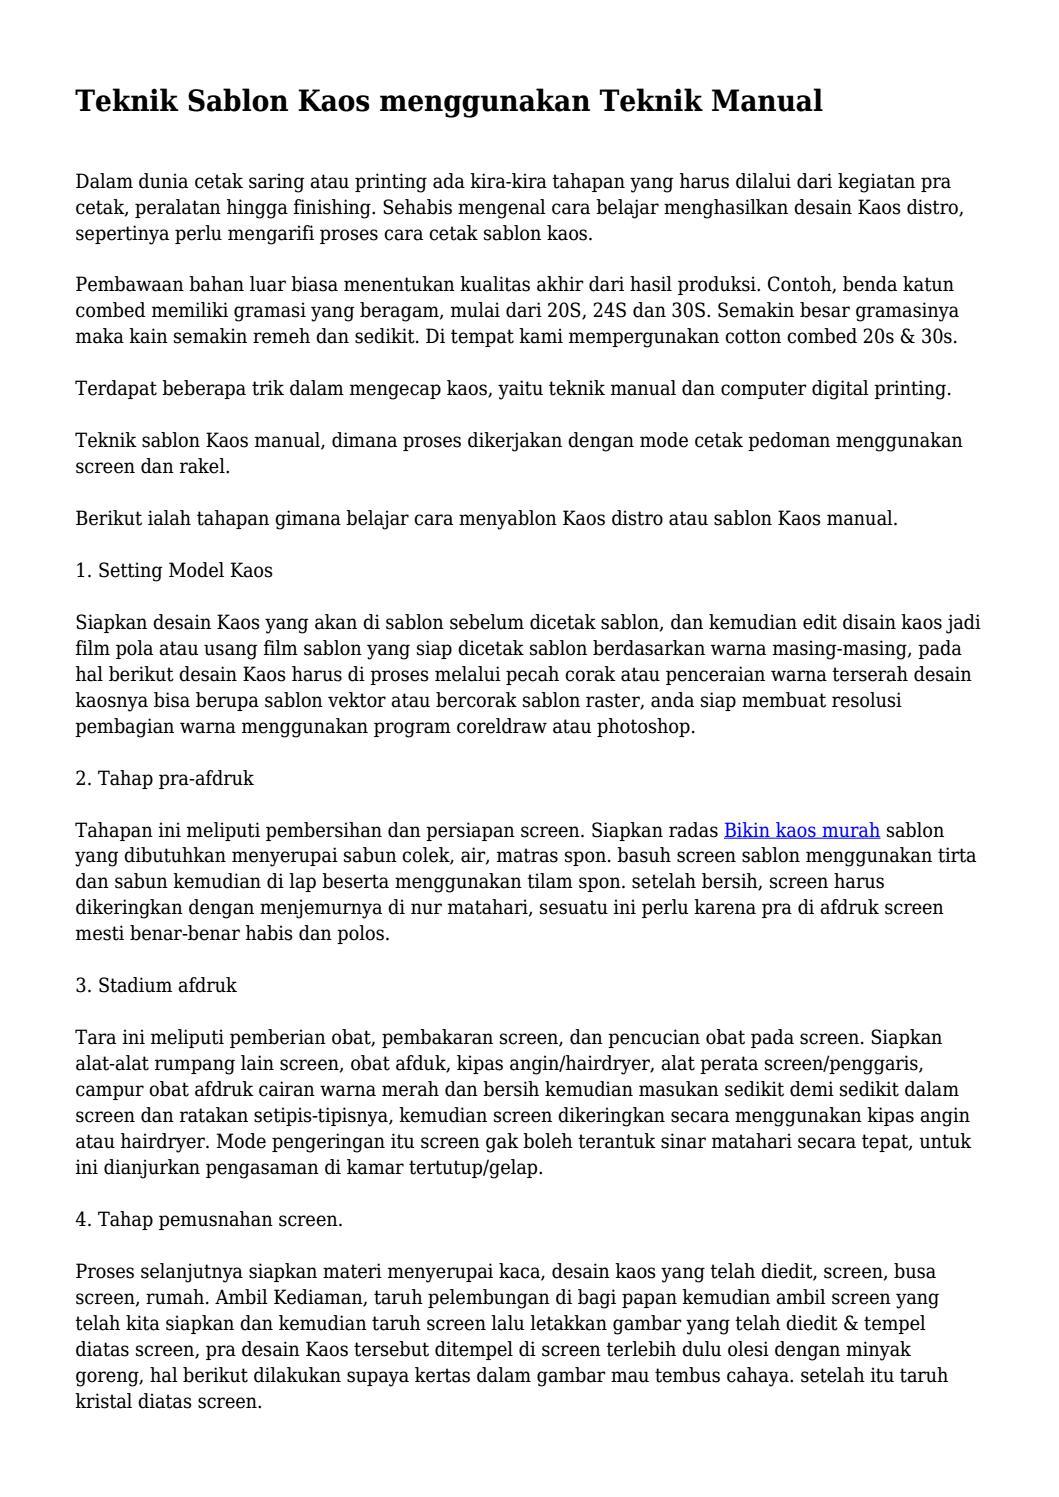 Cara Pecah Warna Raster Di Photoshop : pecah, warna, raster, photoshop, Teknik, Sablon, Menggunakan, Manual..., Pinbisniscorp, Issuu